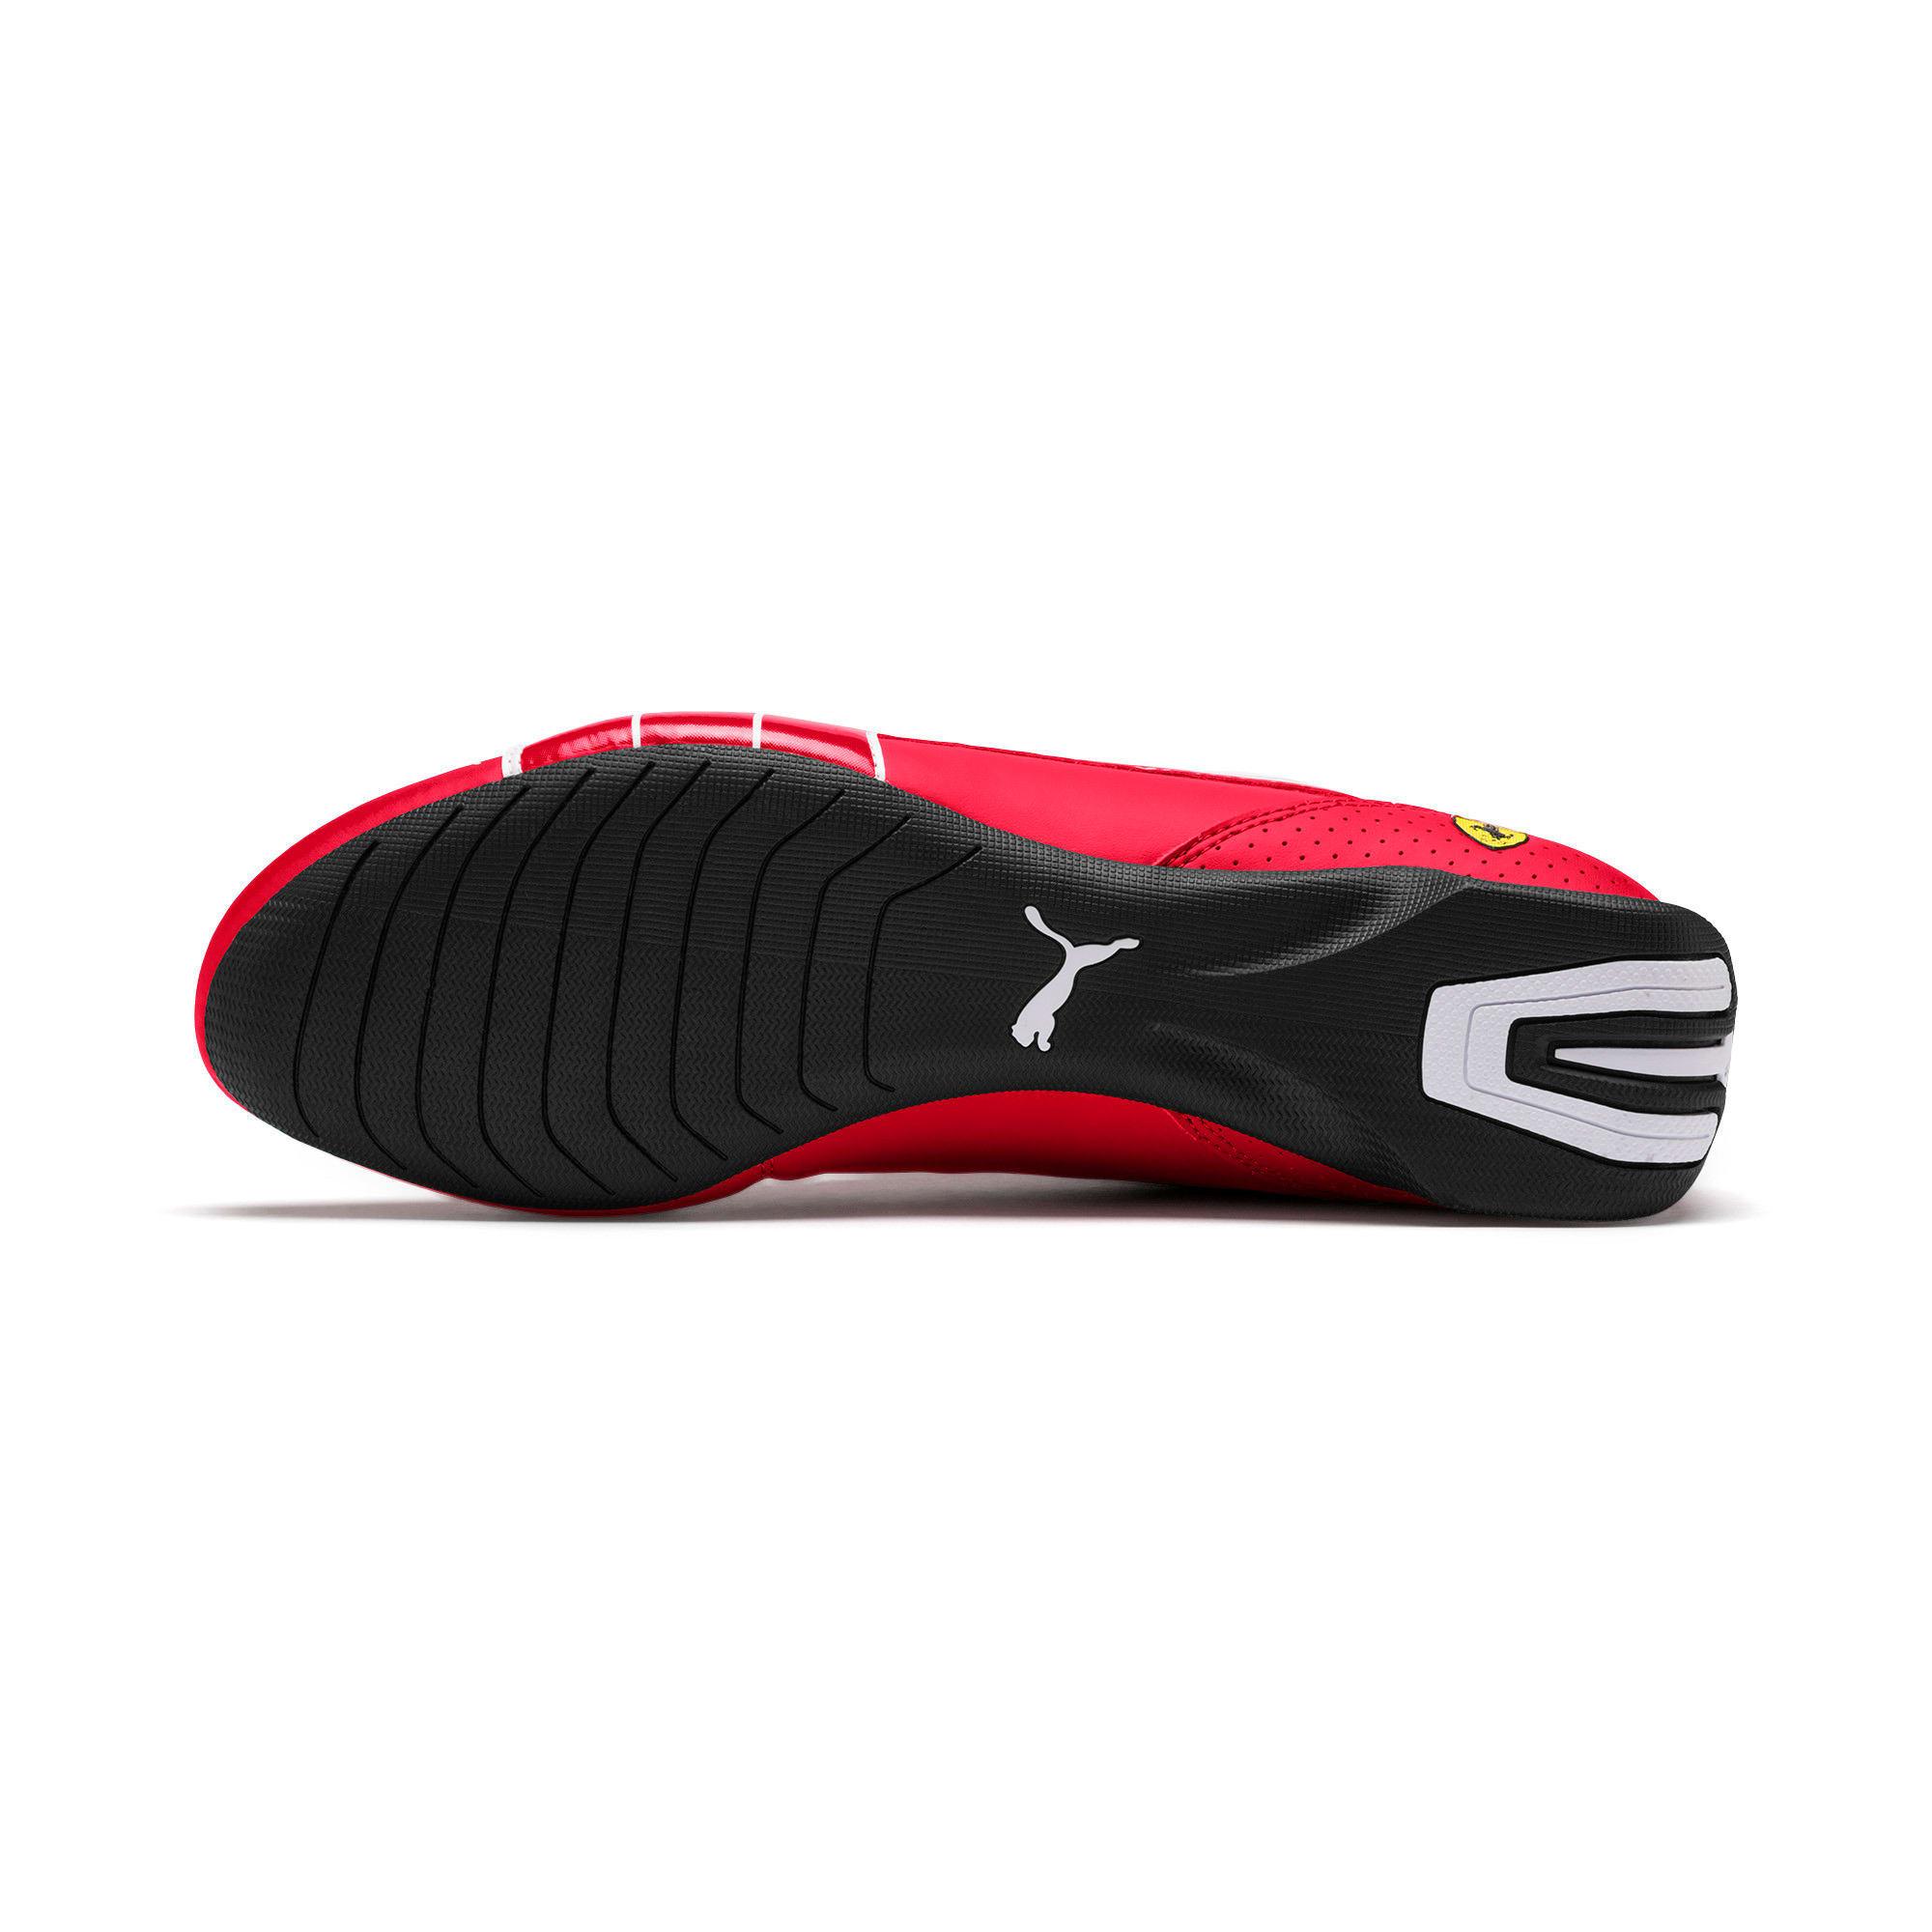 Miniatura 5 de ZapatosScuderiaFerrariFuture Kart Cat, Rosso Corsa-Puma Black, mediano